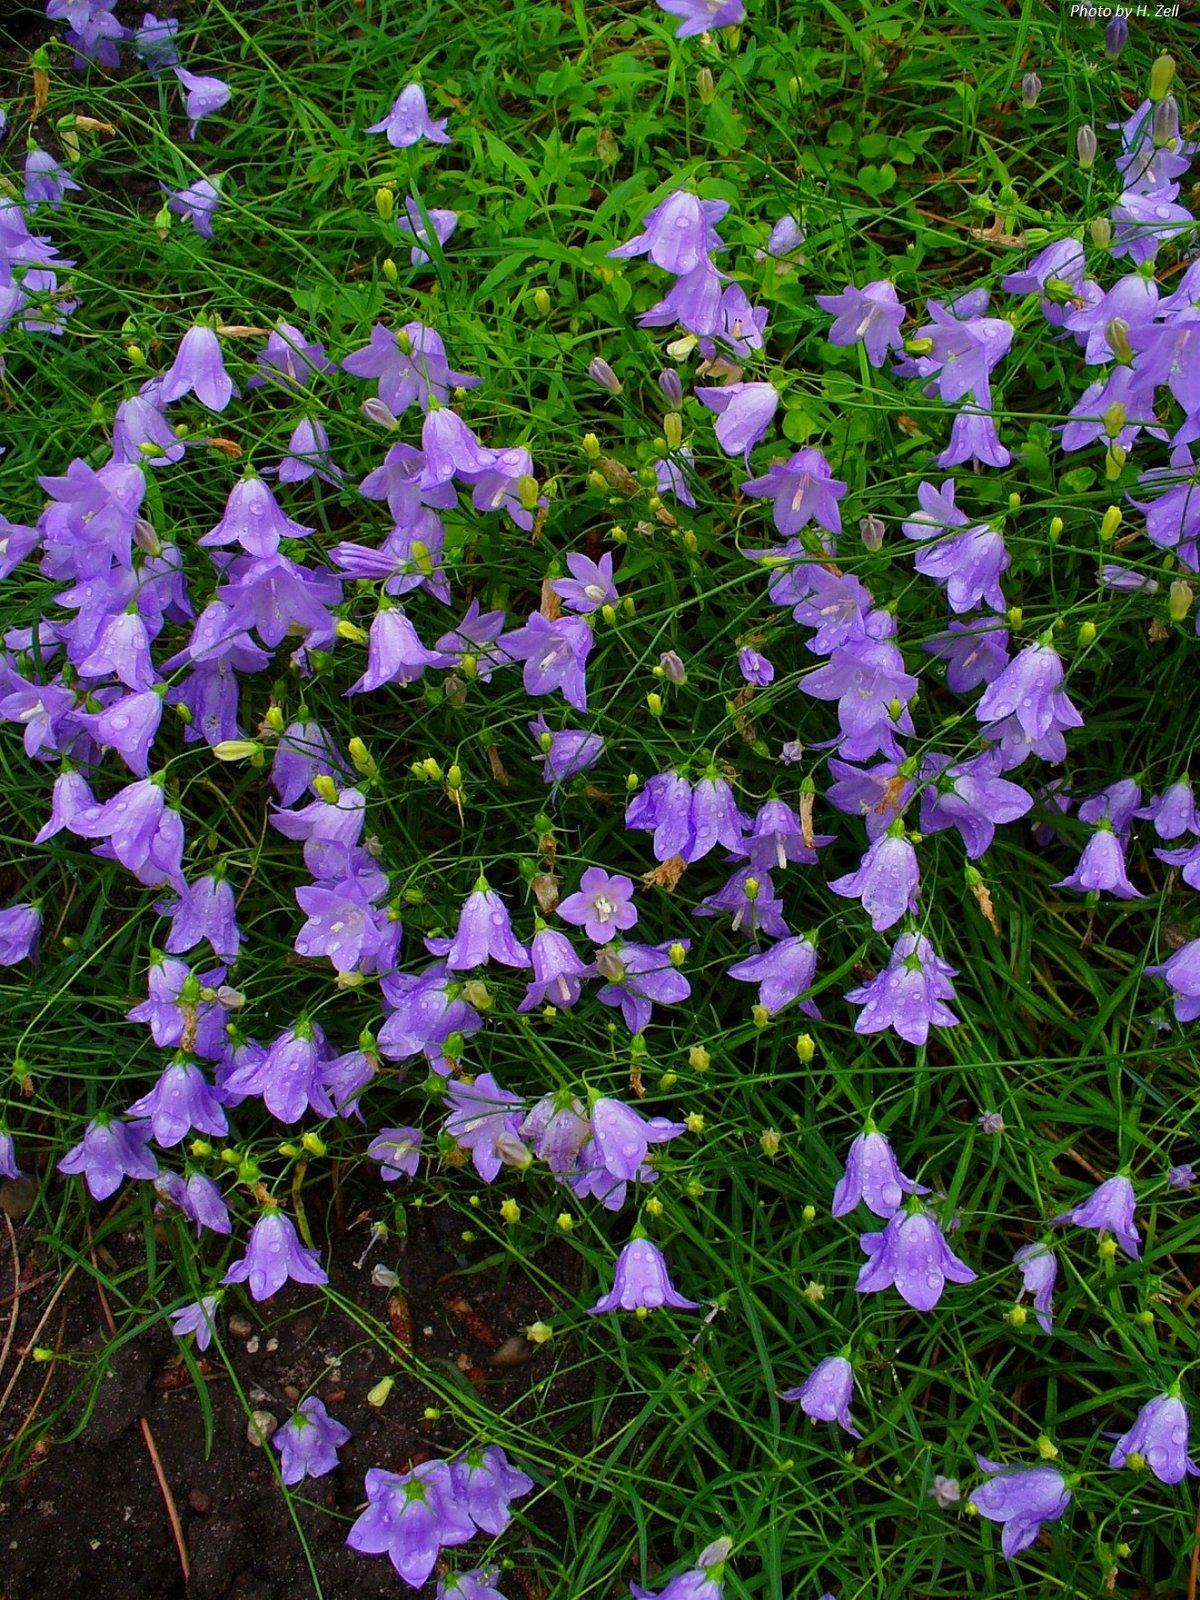 Bluebells or Harebells : Campanula rotundifolia